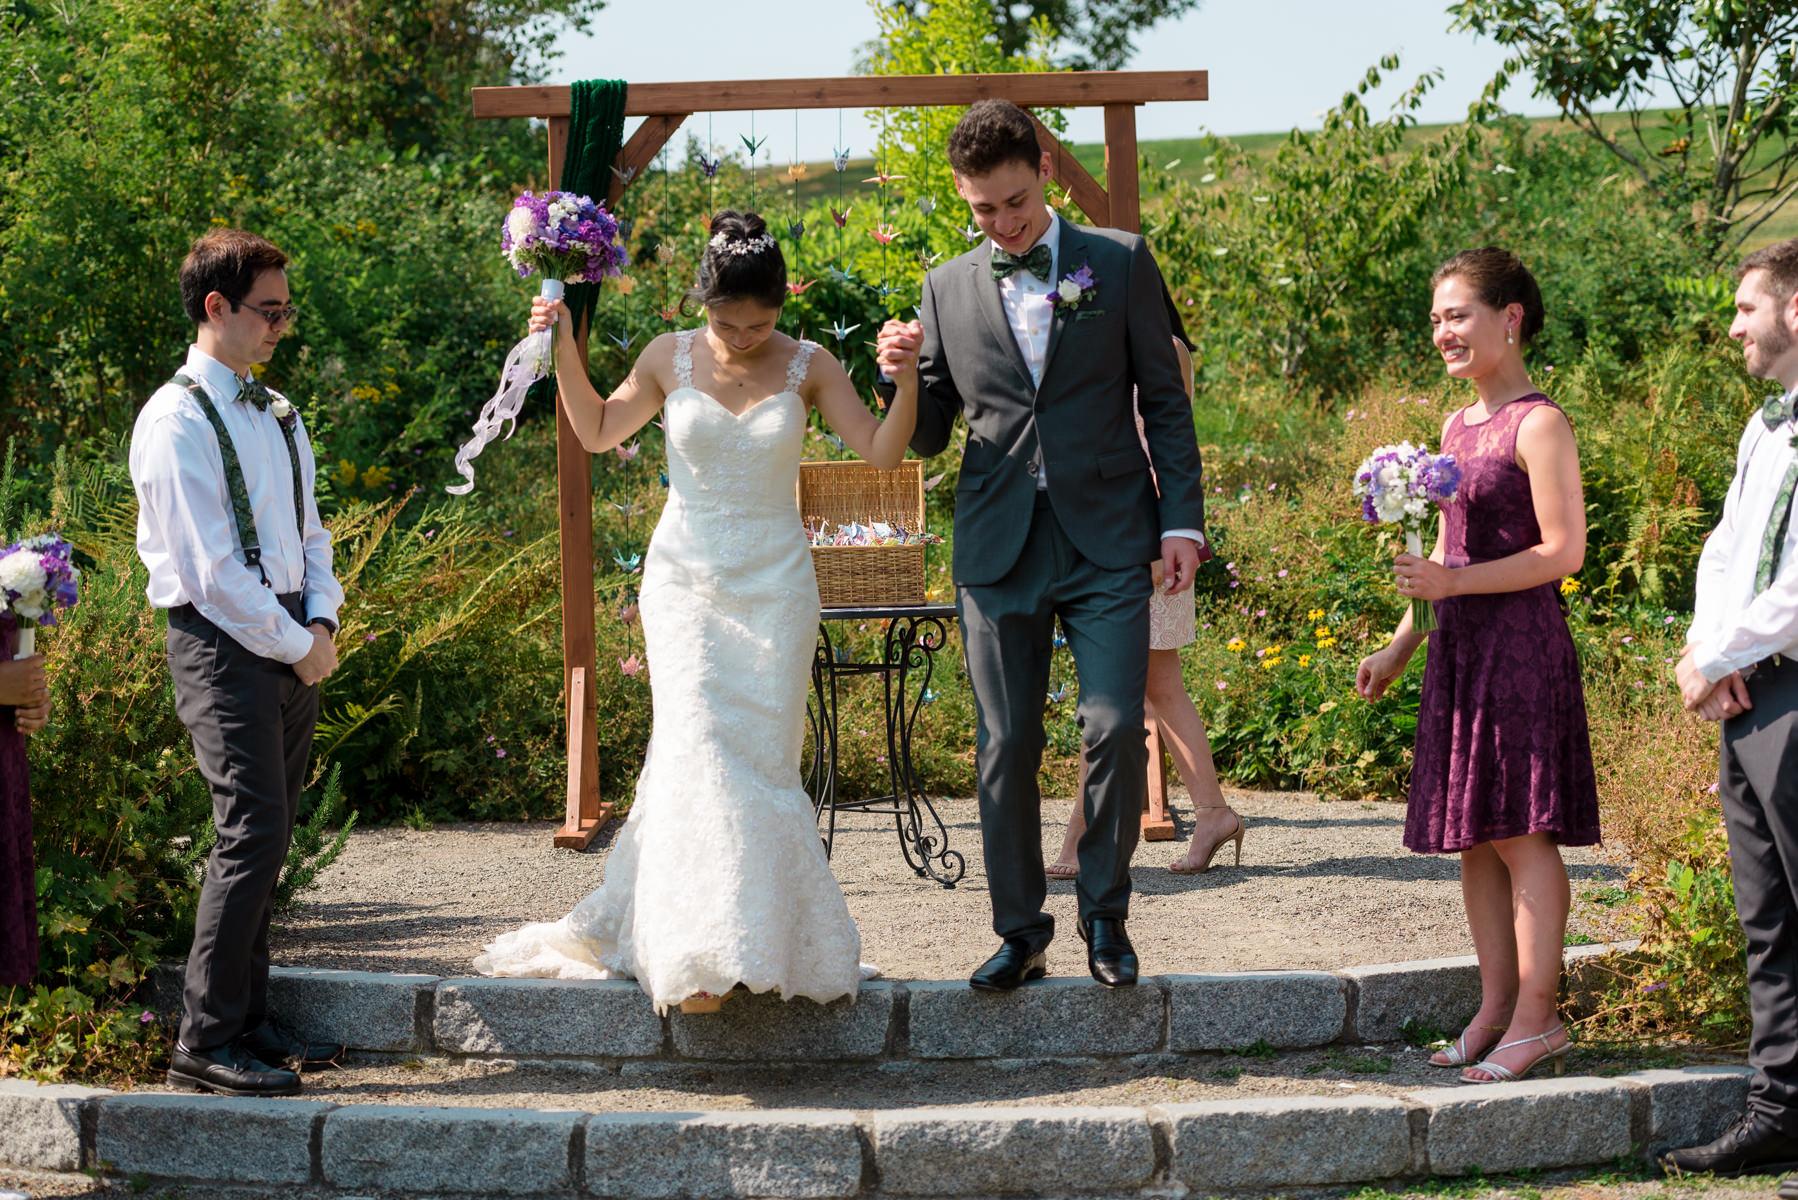 Andrew Tat - Documentary Wedding Photography - Heritage Hall - Kirkland, Washington - Grace & James - 54.JPG